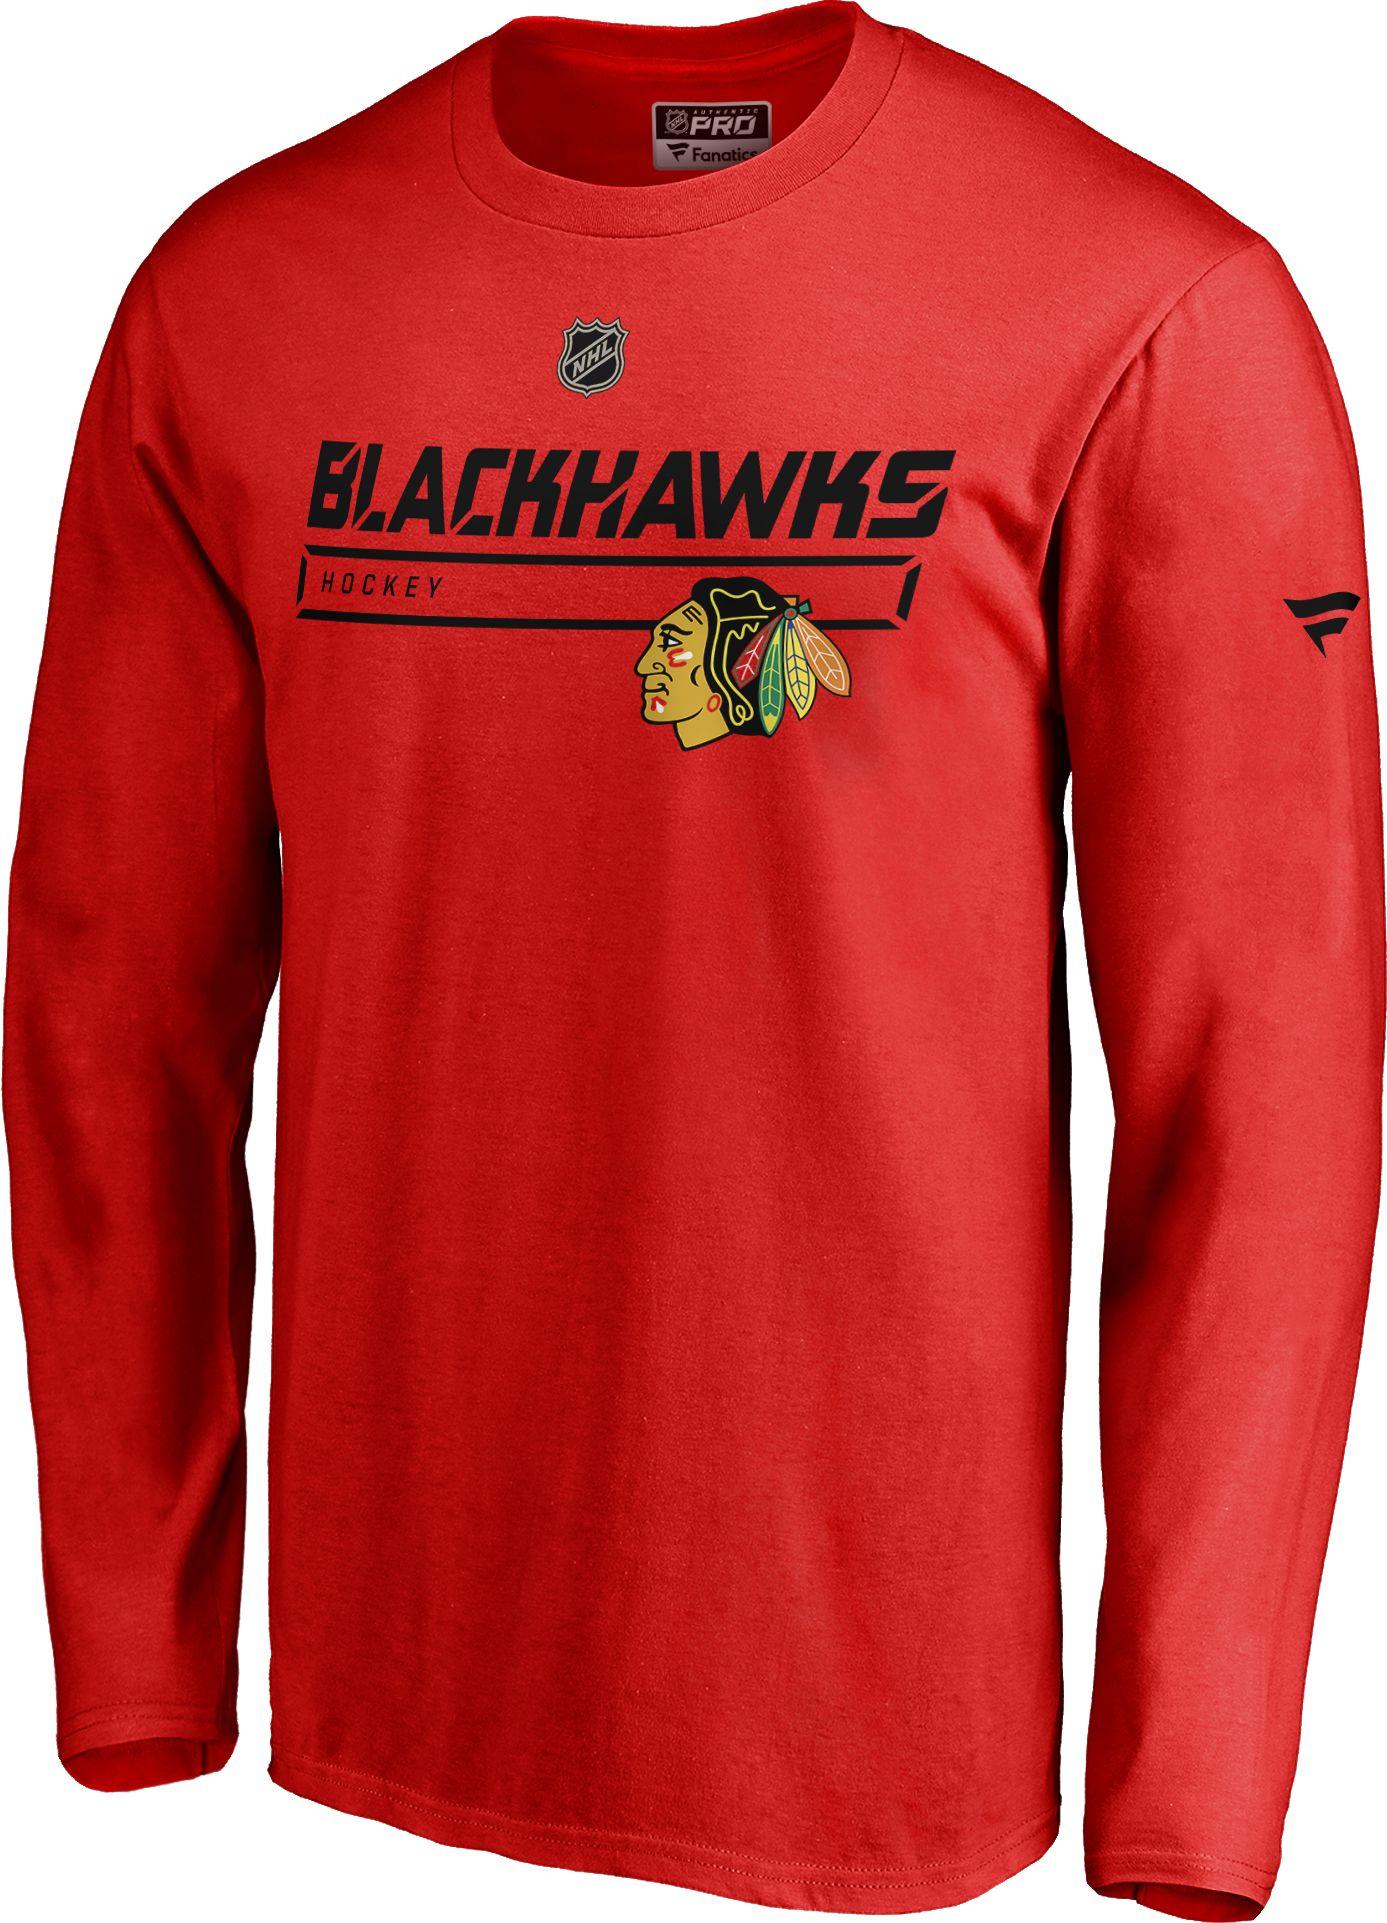 1b0743522 Reebok Chicago Blackhawks Long Sleeve T Shirt - Cotswold Hire